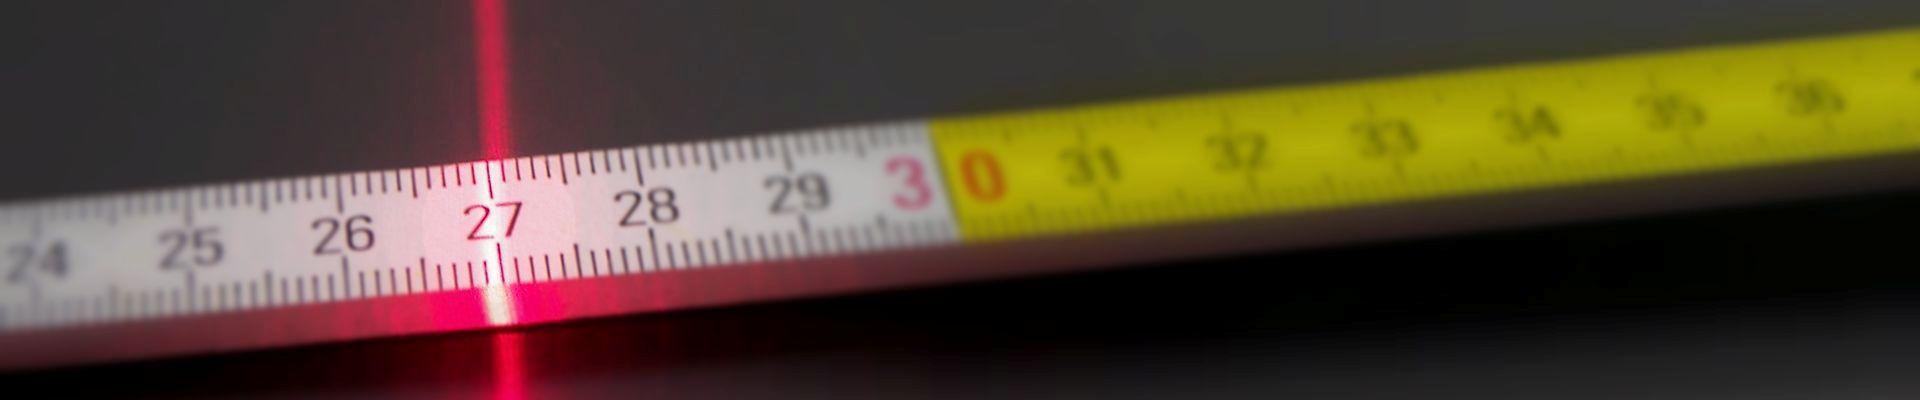 Vetro sintetico su misura vendita online su misura for Vetro sintetico su misura